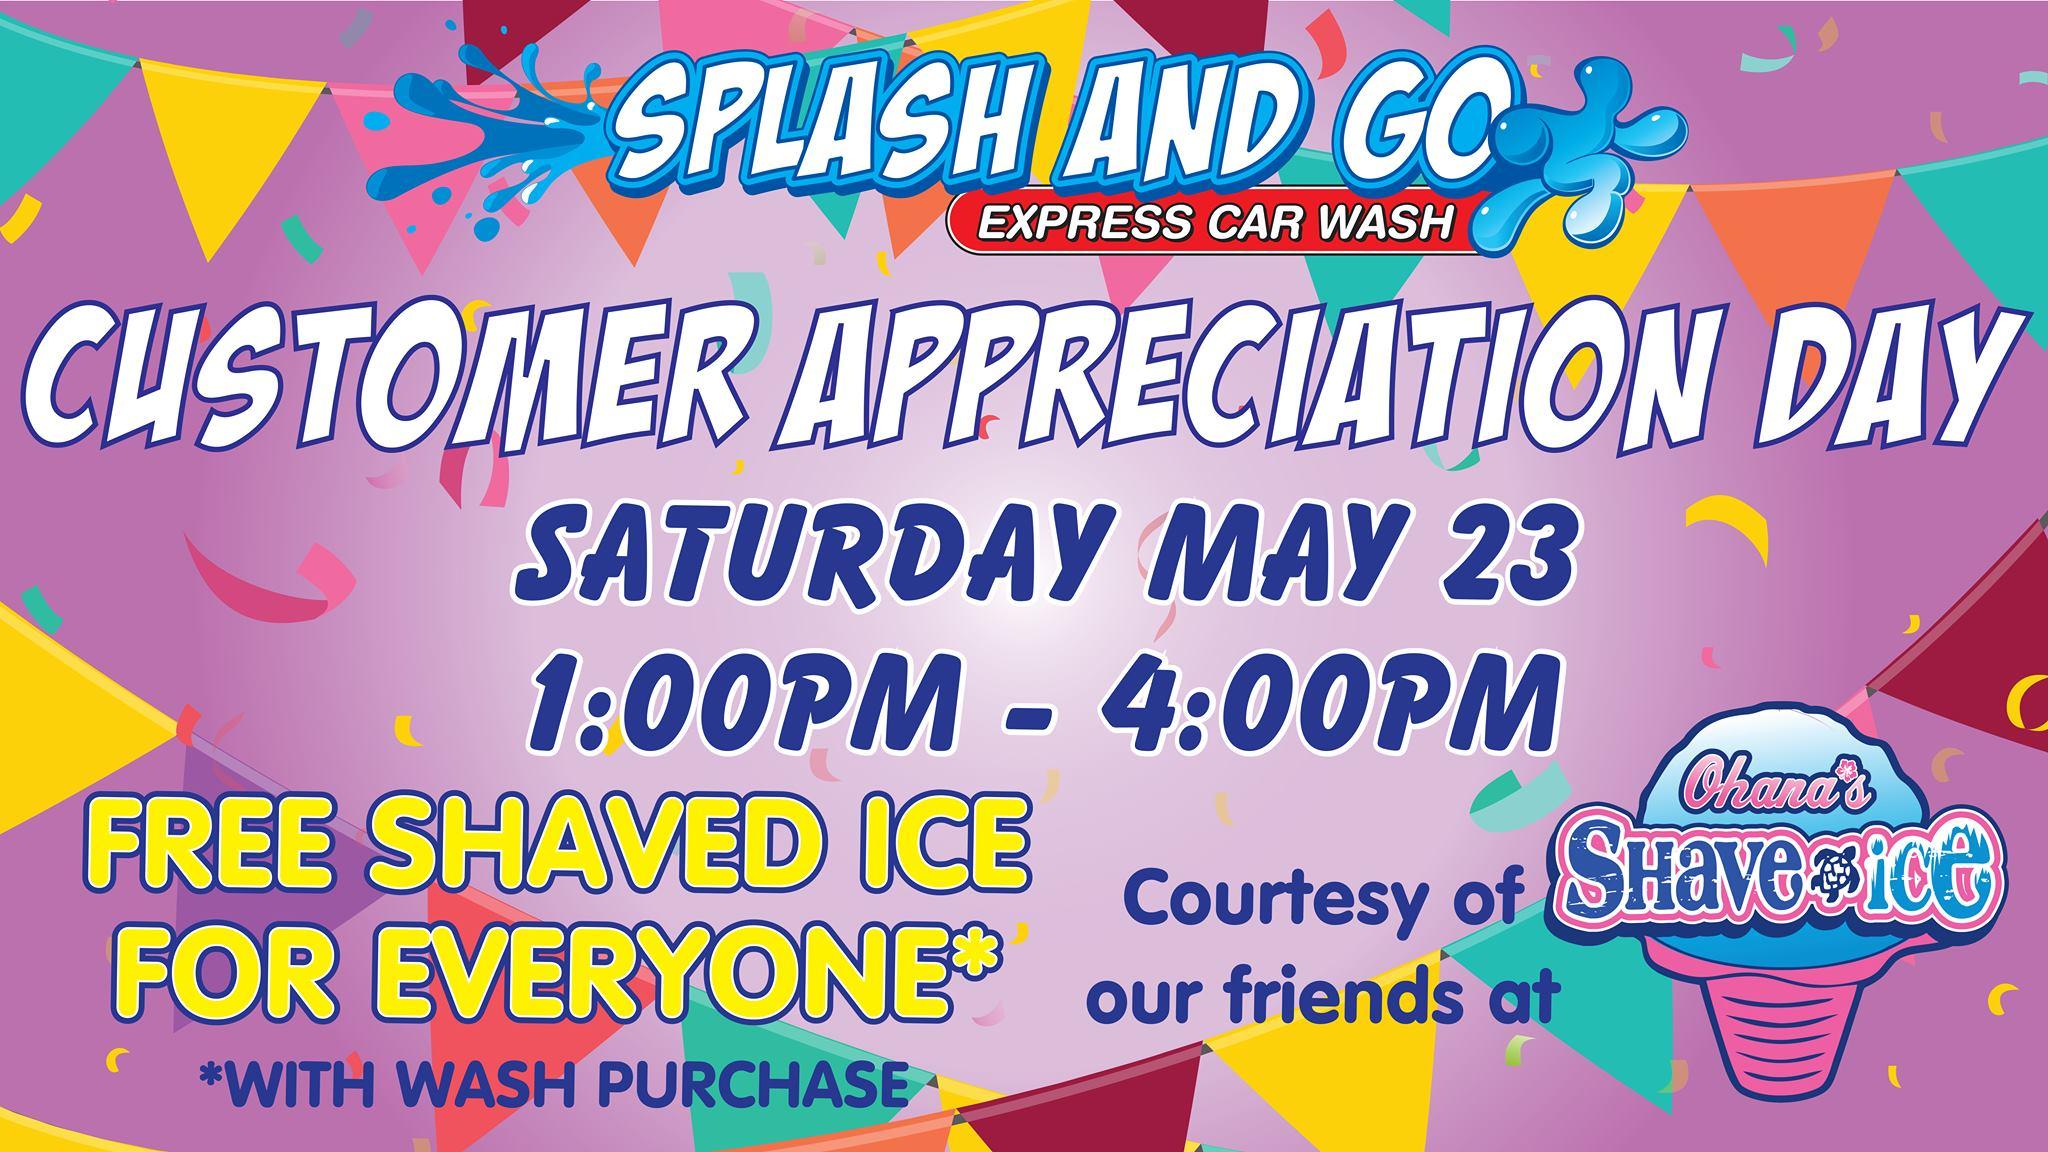 car wash customer appreciation lee's summit